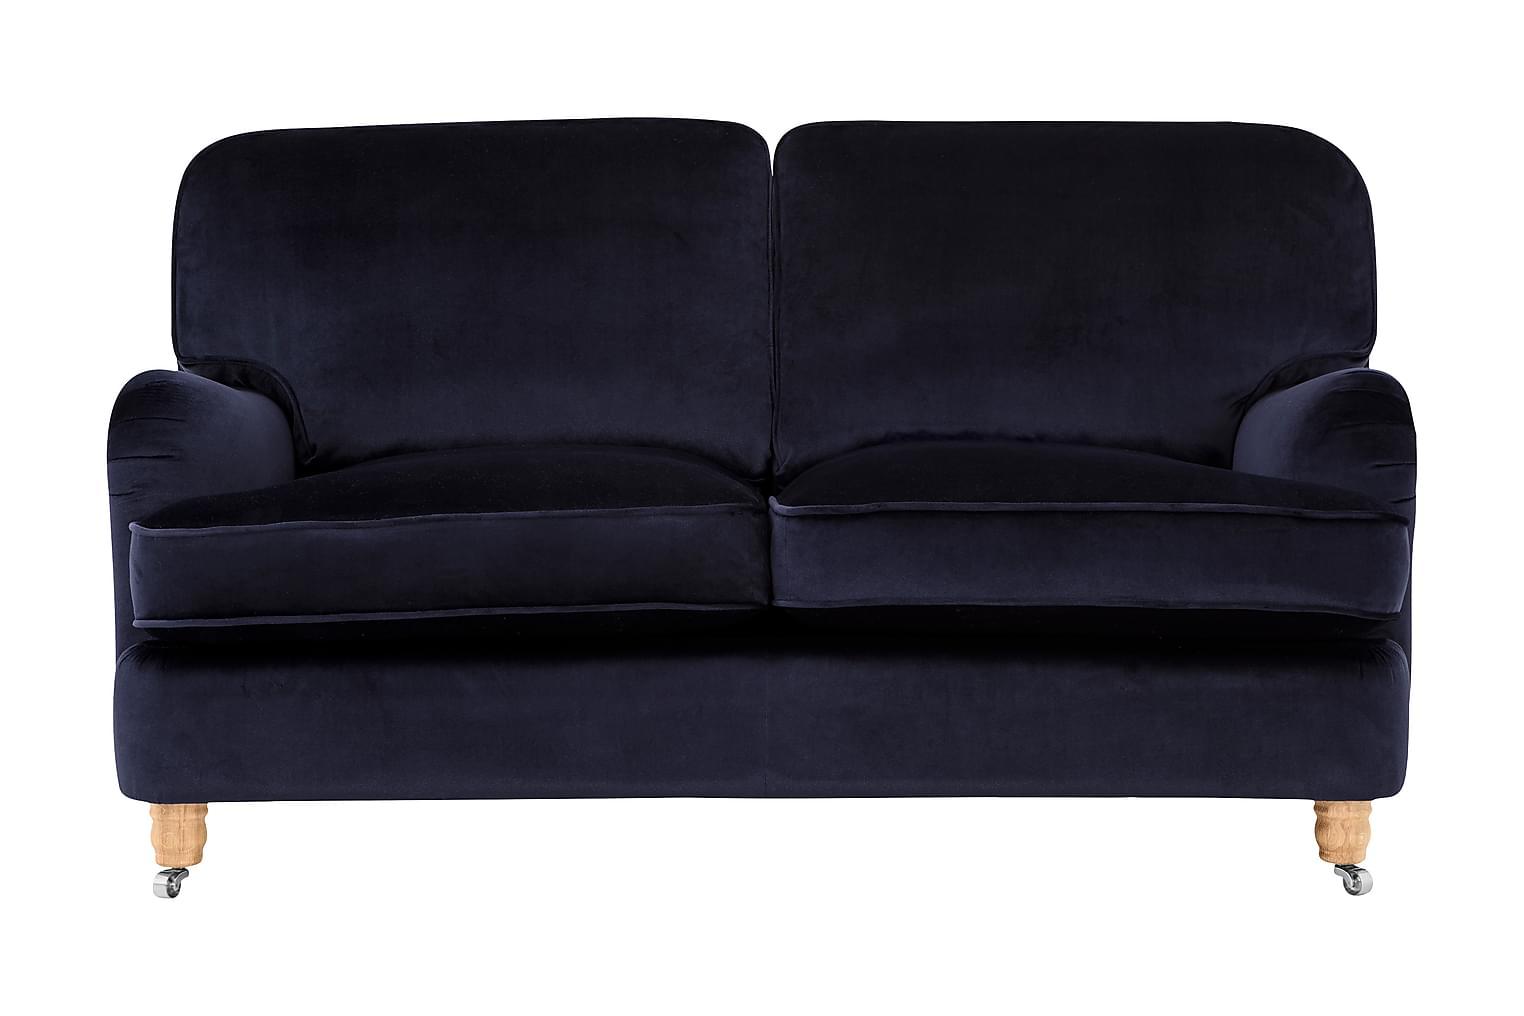 Howard-Deluxe HOWARD-DELUXE 2-sits Soffa Sammet Mörkblå -